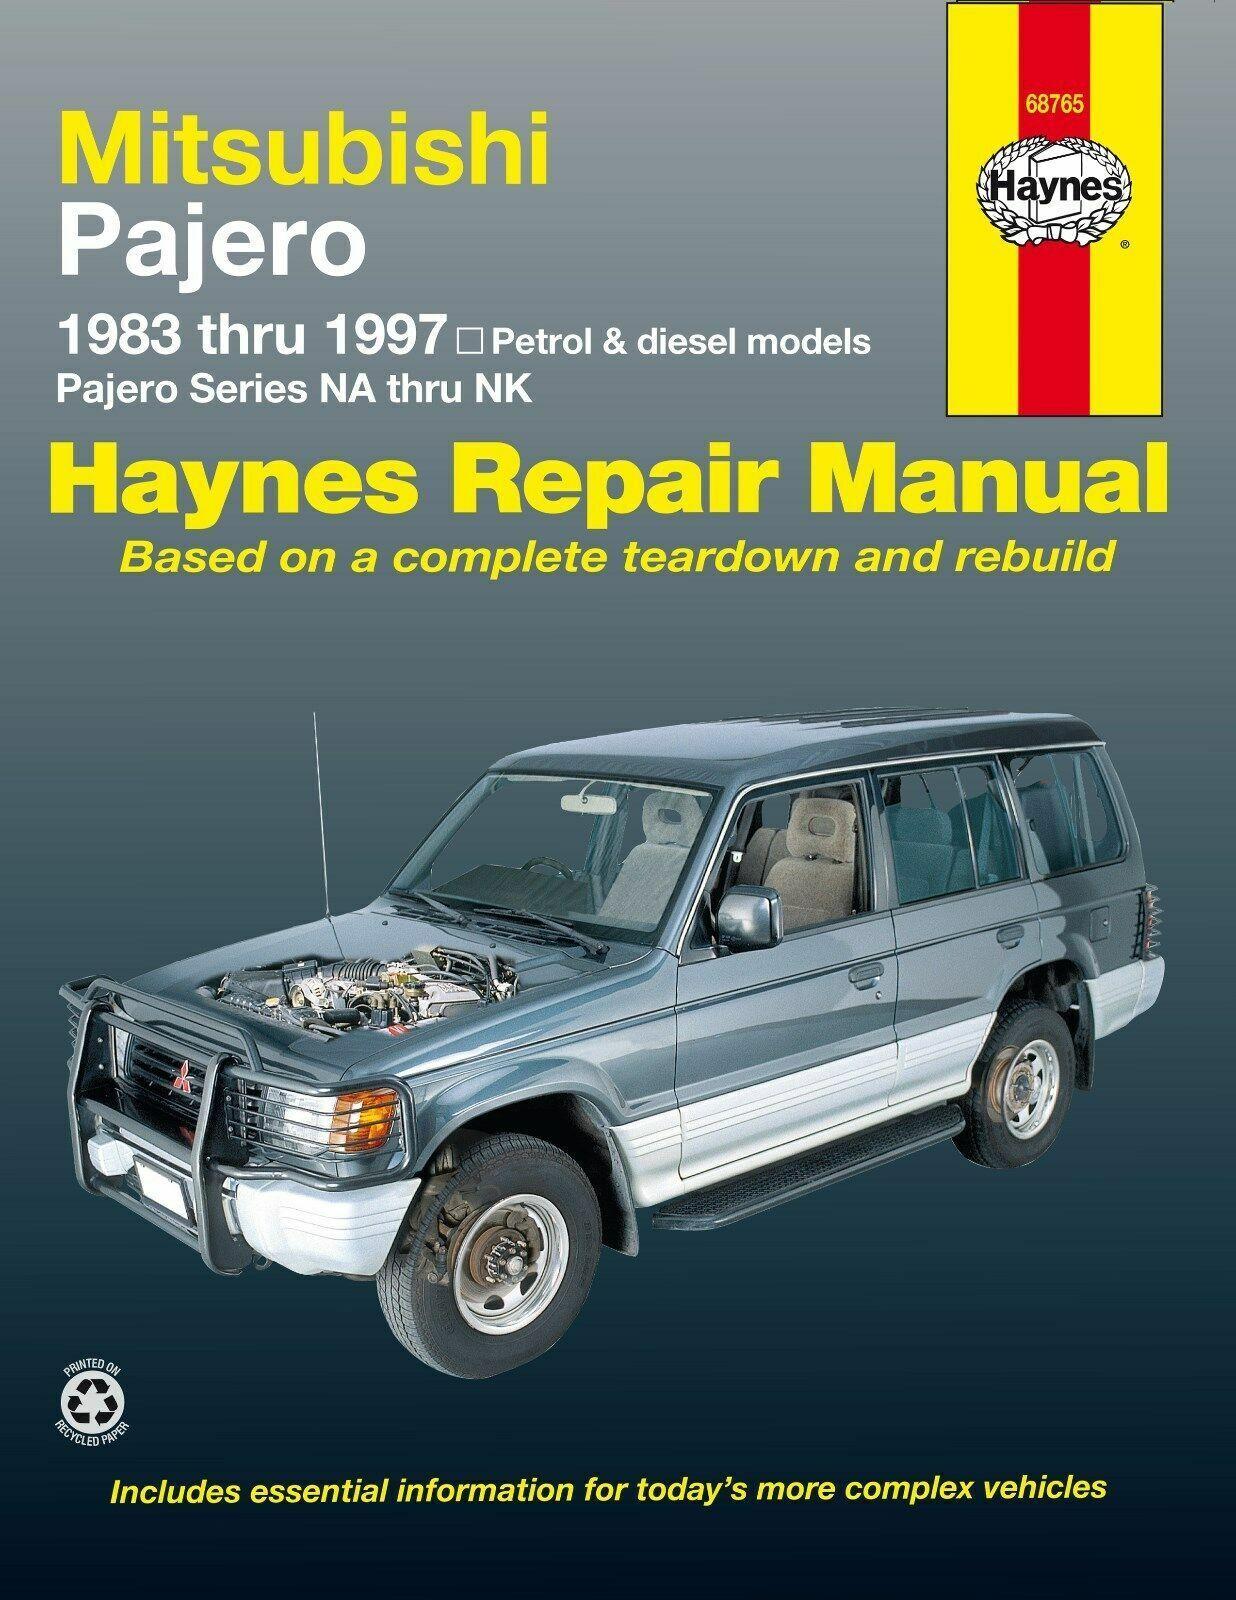 Haynes Manual 68765 Mitsubishi Pajero (1983 - 1997) Workshop Manual